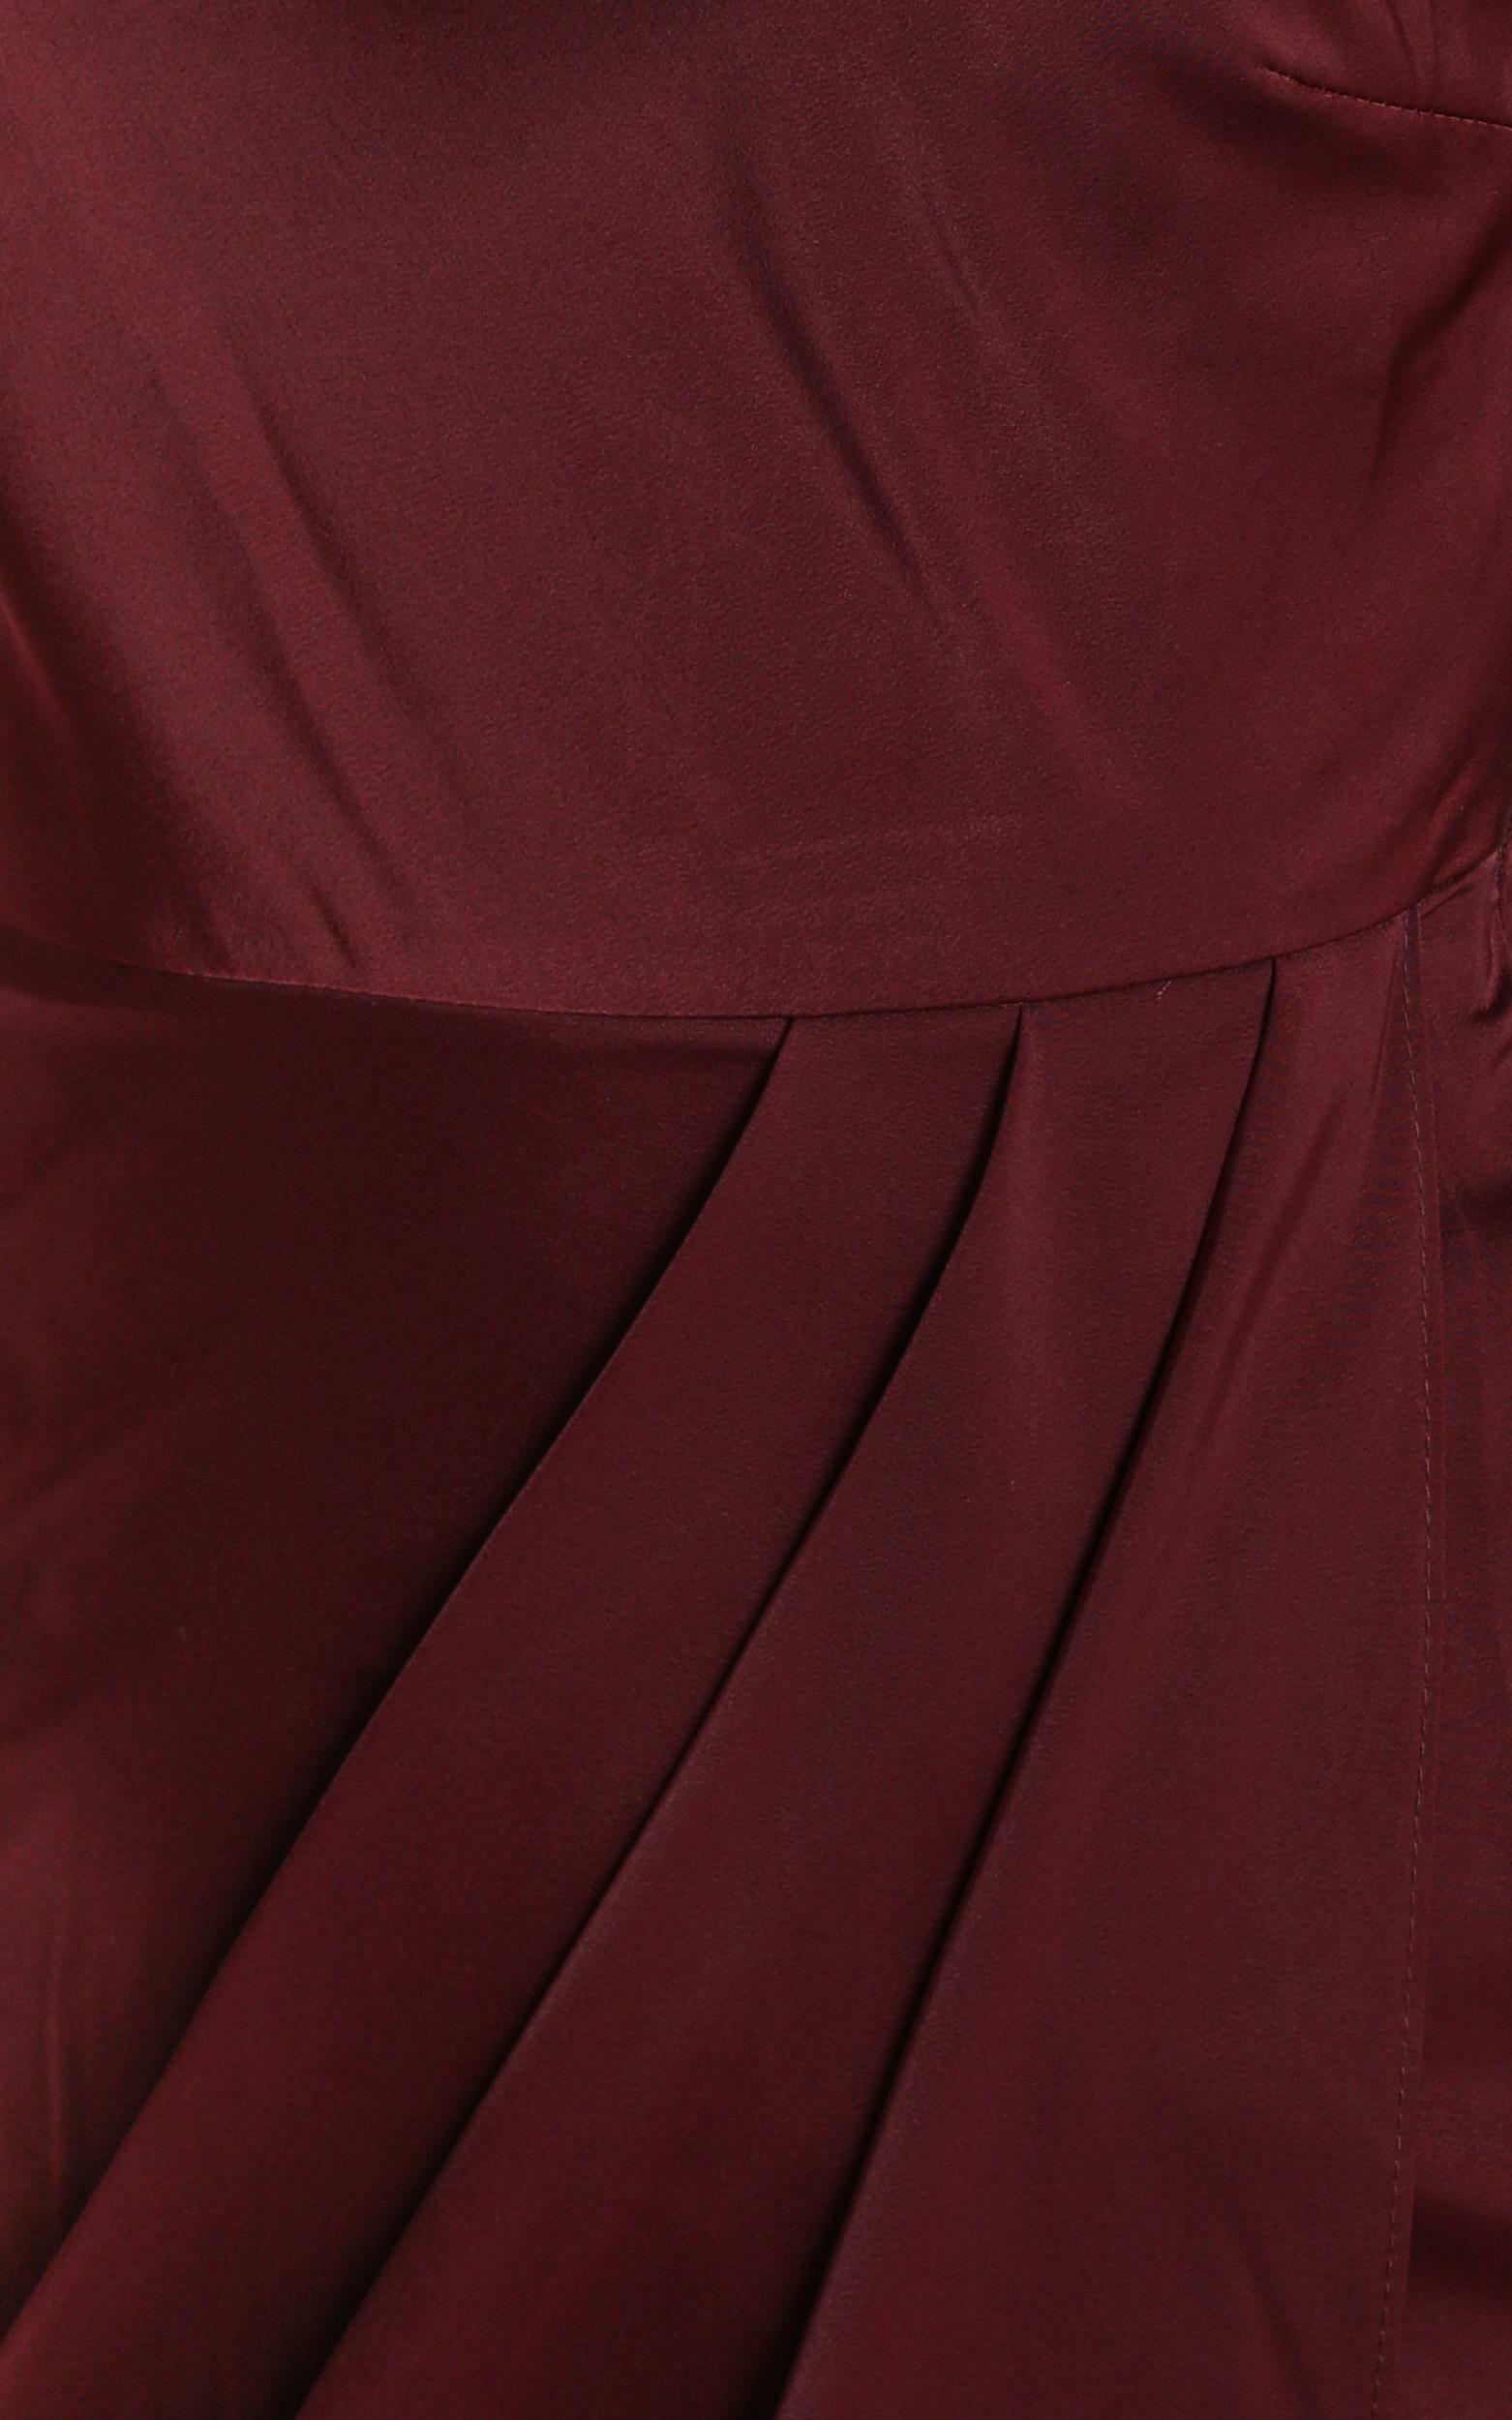 Felt So Happy Dress in wine - 20 (XXXXL), Wine, hi-res image number null